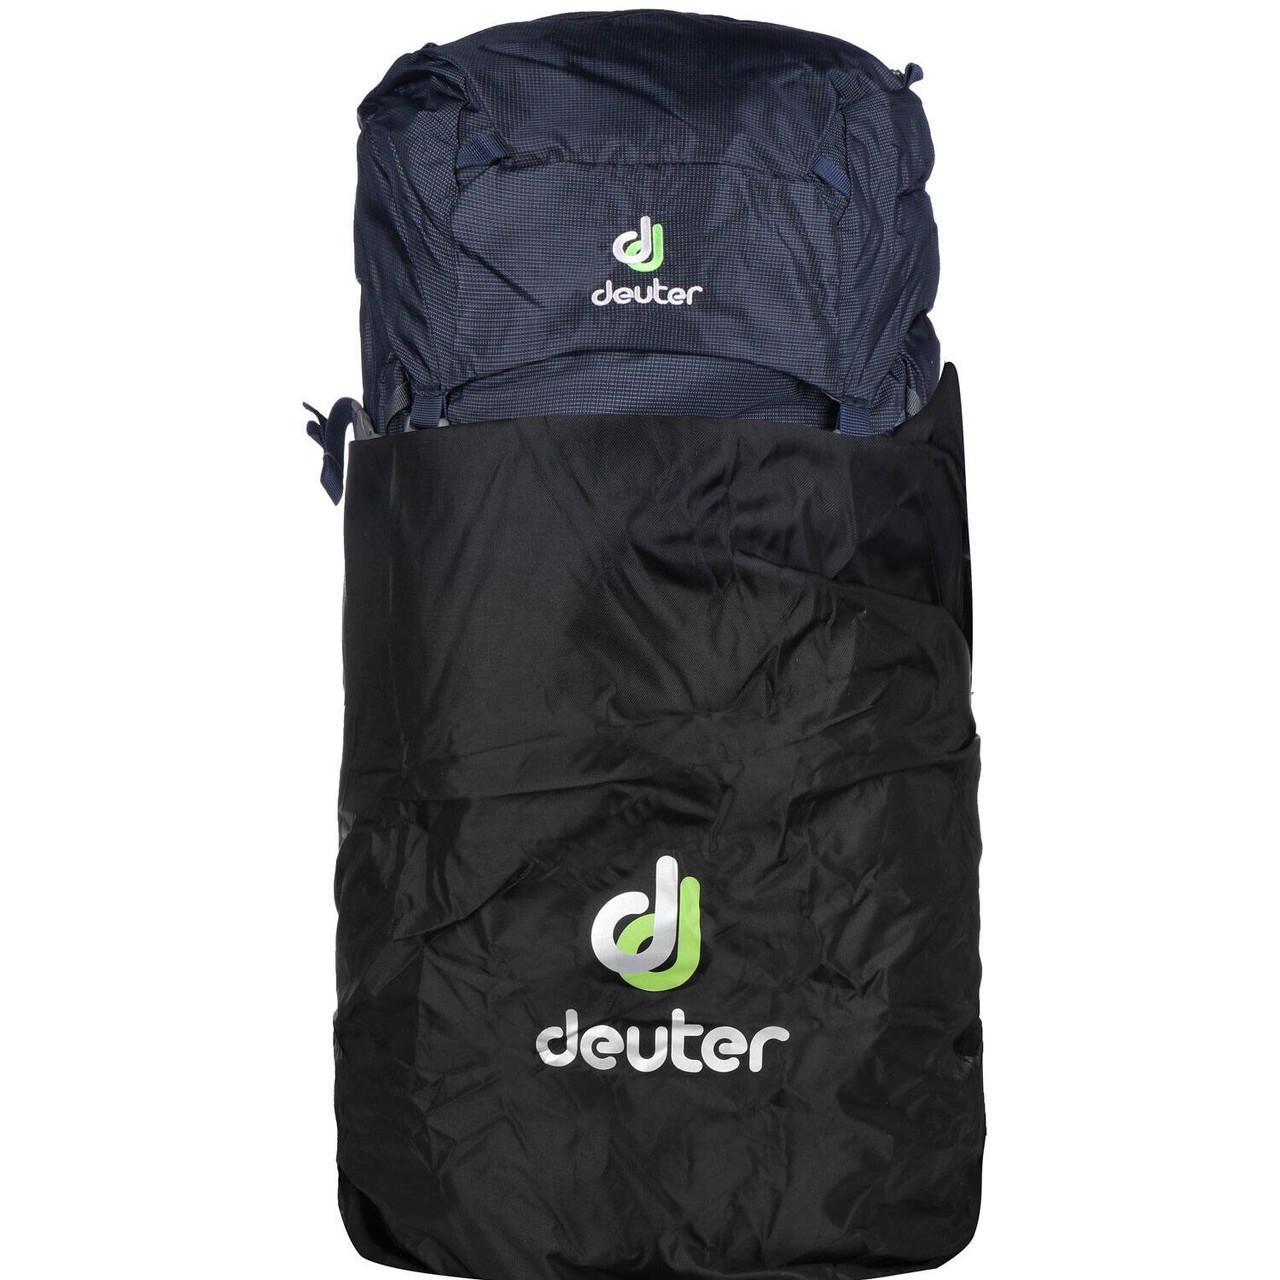 Защитный чехол для рюкзака Deuter Flight Cover 90 black (3944116 7000)